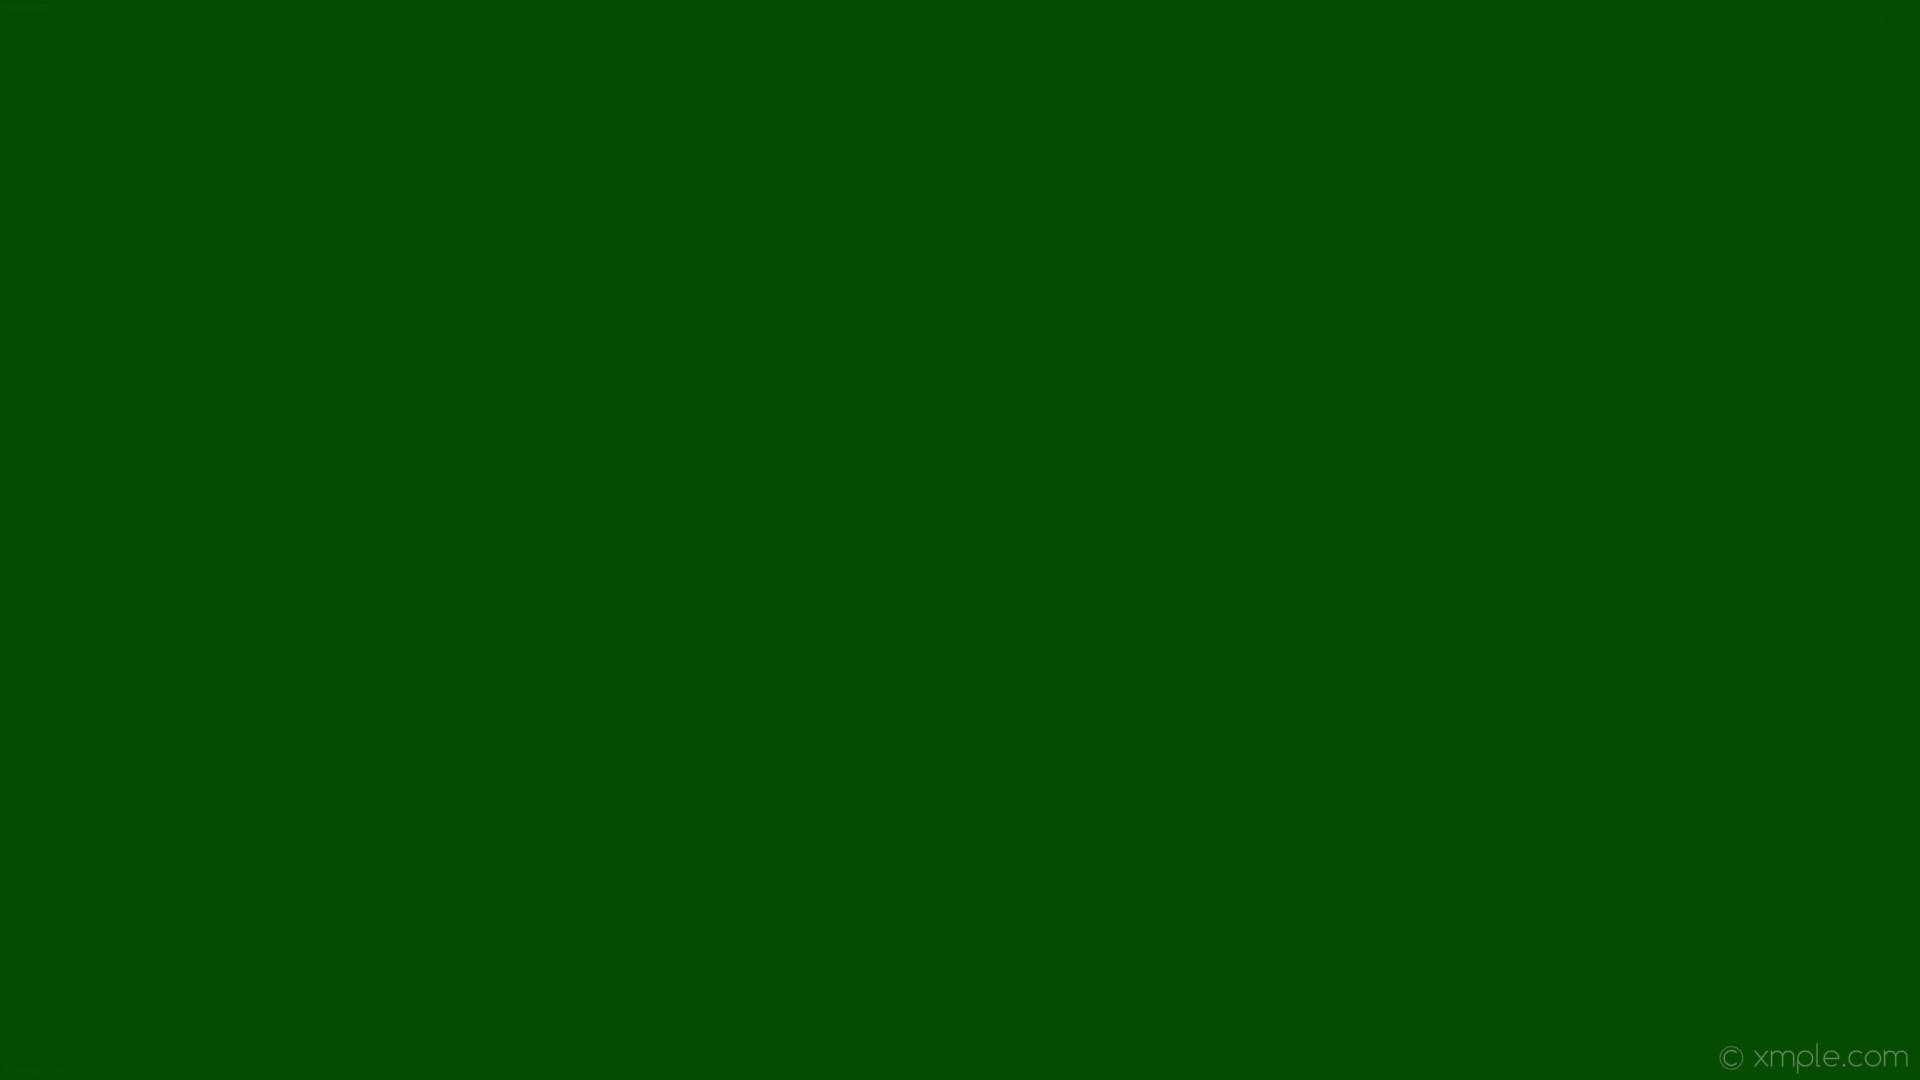 wallpaper green one colour plain solid color single dark green #064c00